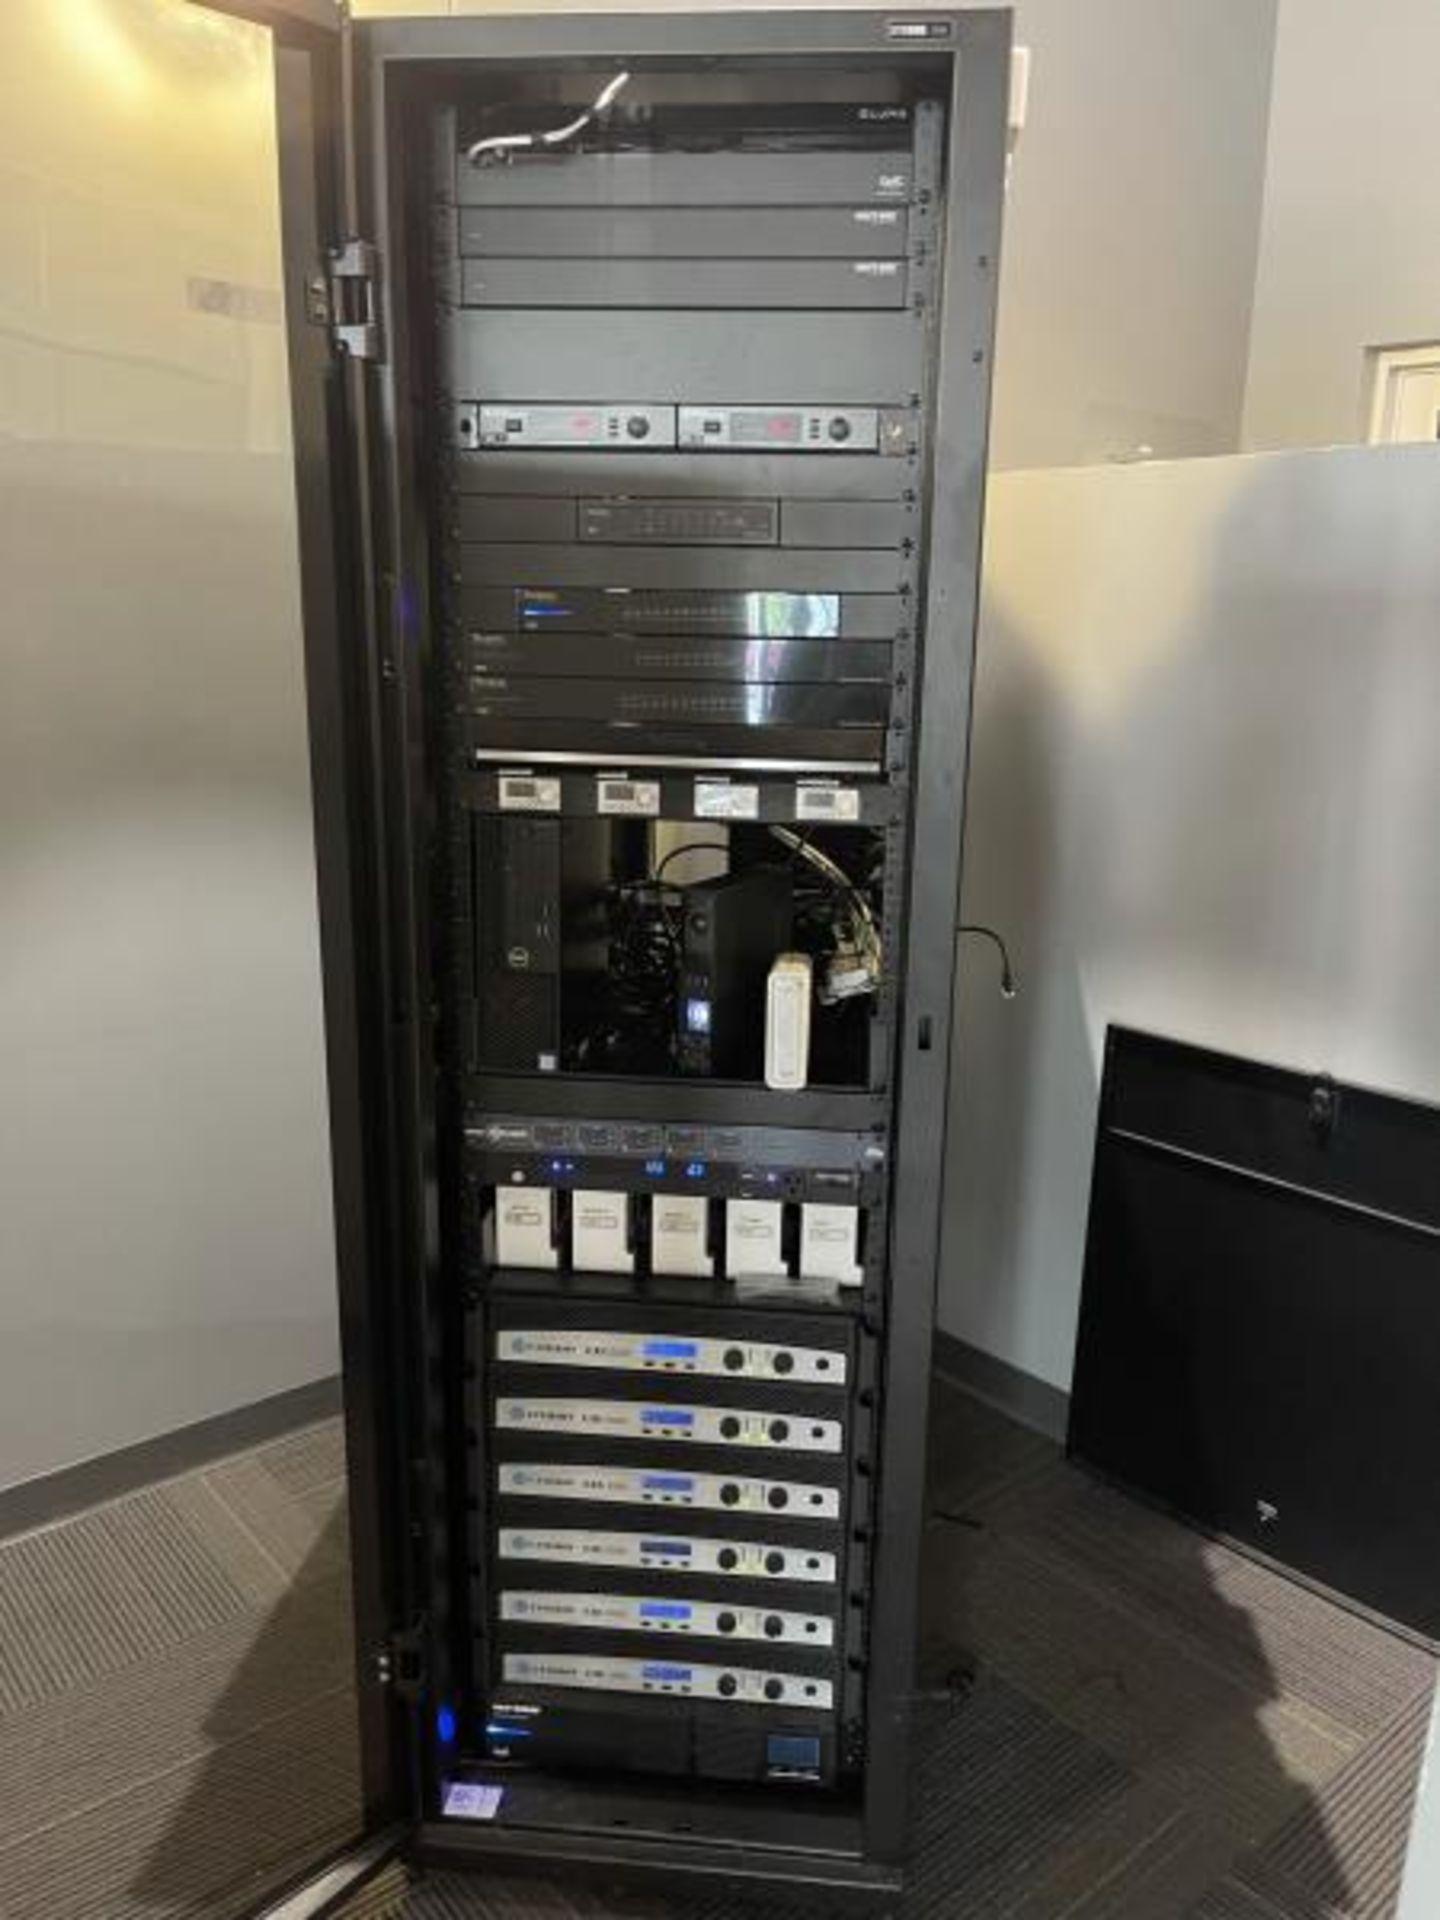 Electornics Cabinet by Strong , Made 2018 w/ Luma Network Box, OVRC Enabled LUM-500-DVR-16CH, (2) Wa